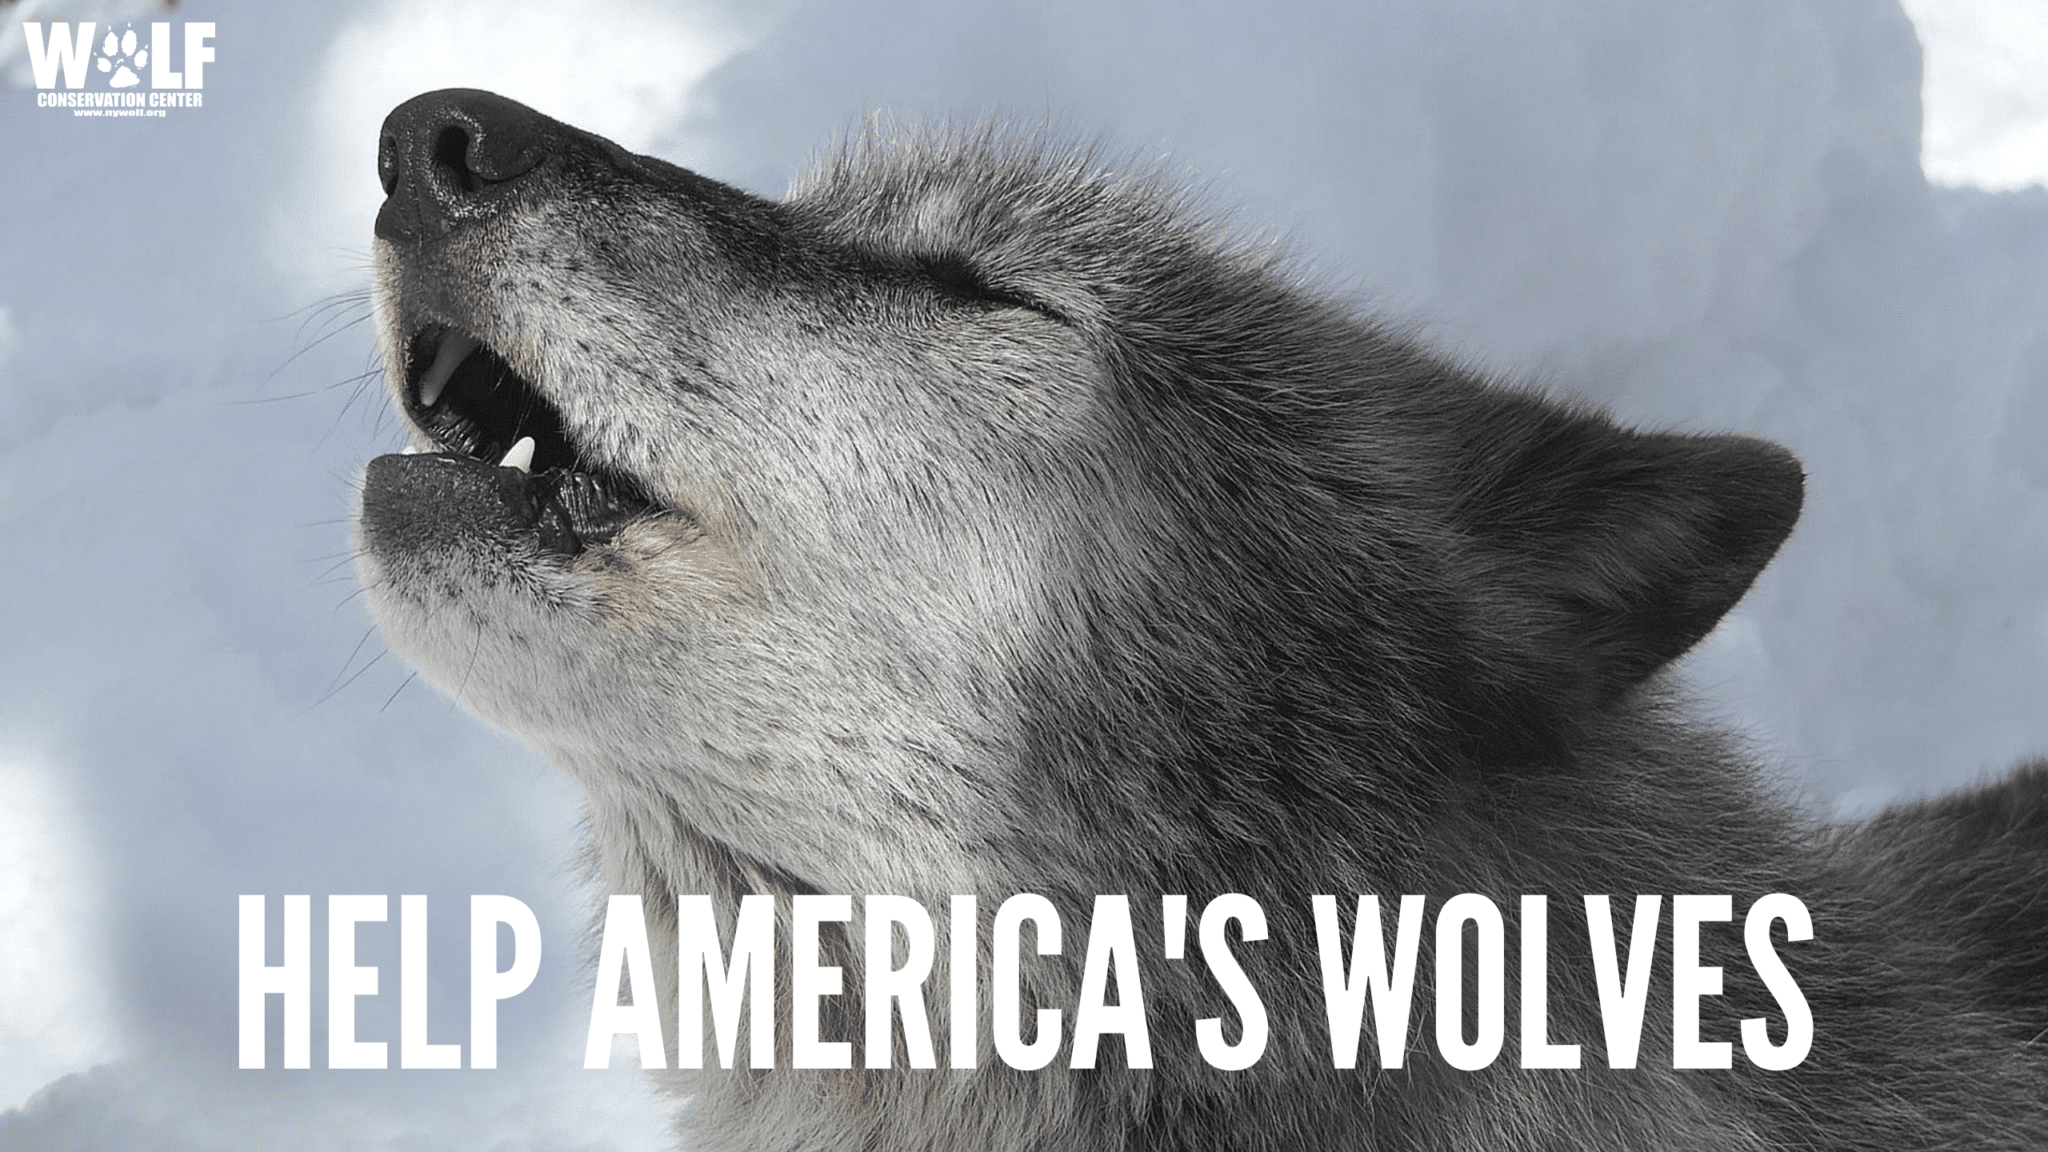 Savewolves